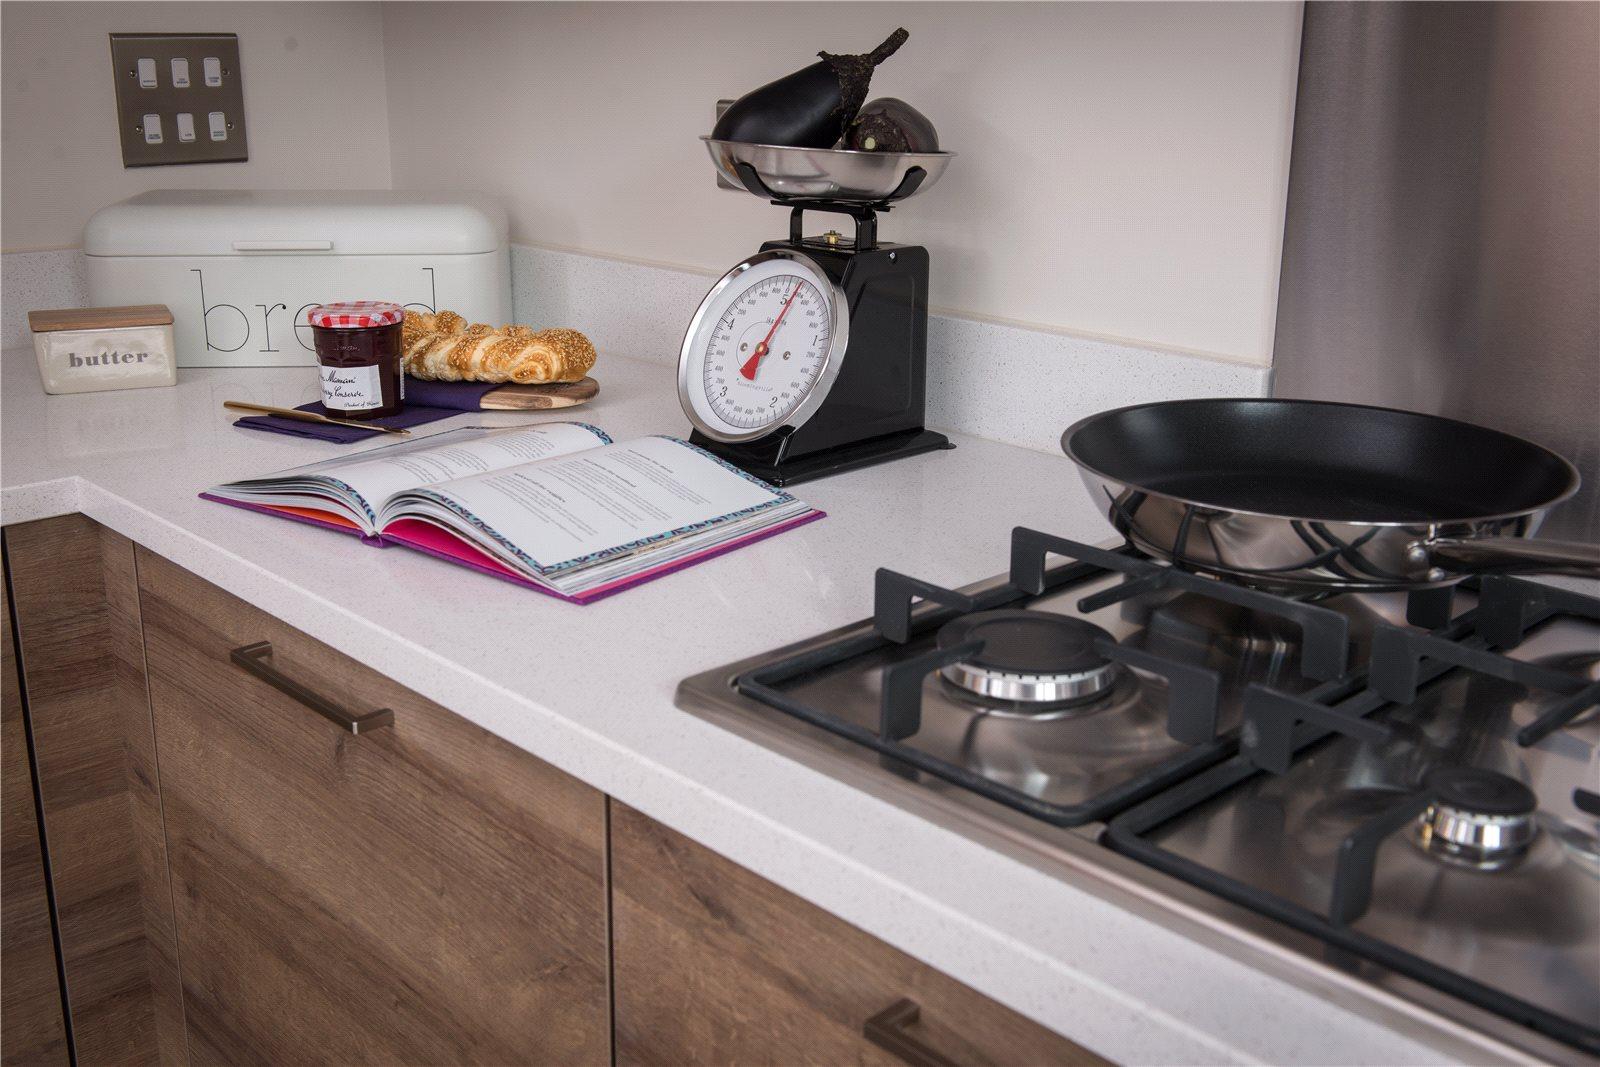 Rushmon Homes,Bosch,Appliance